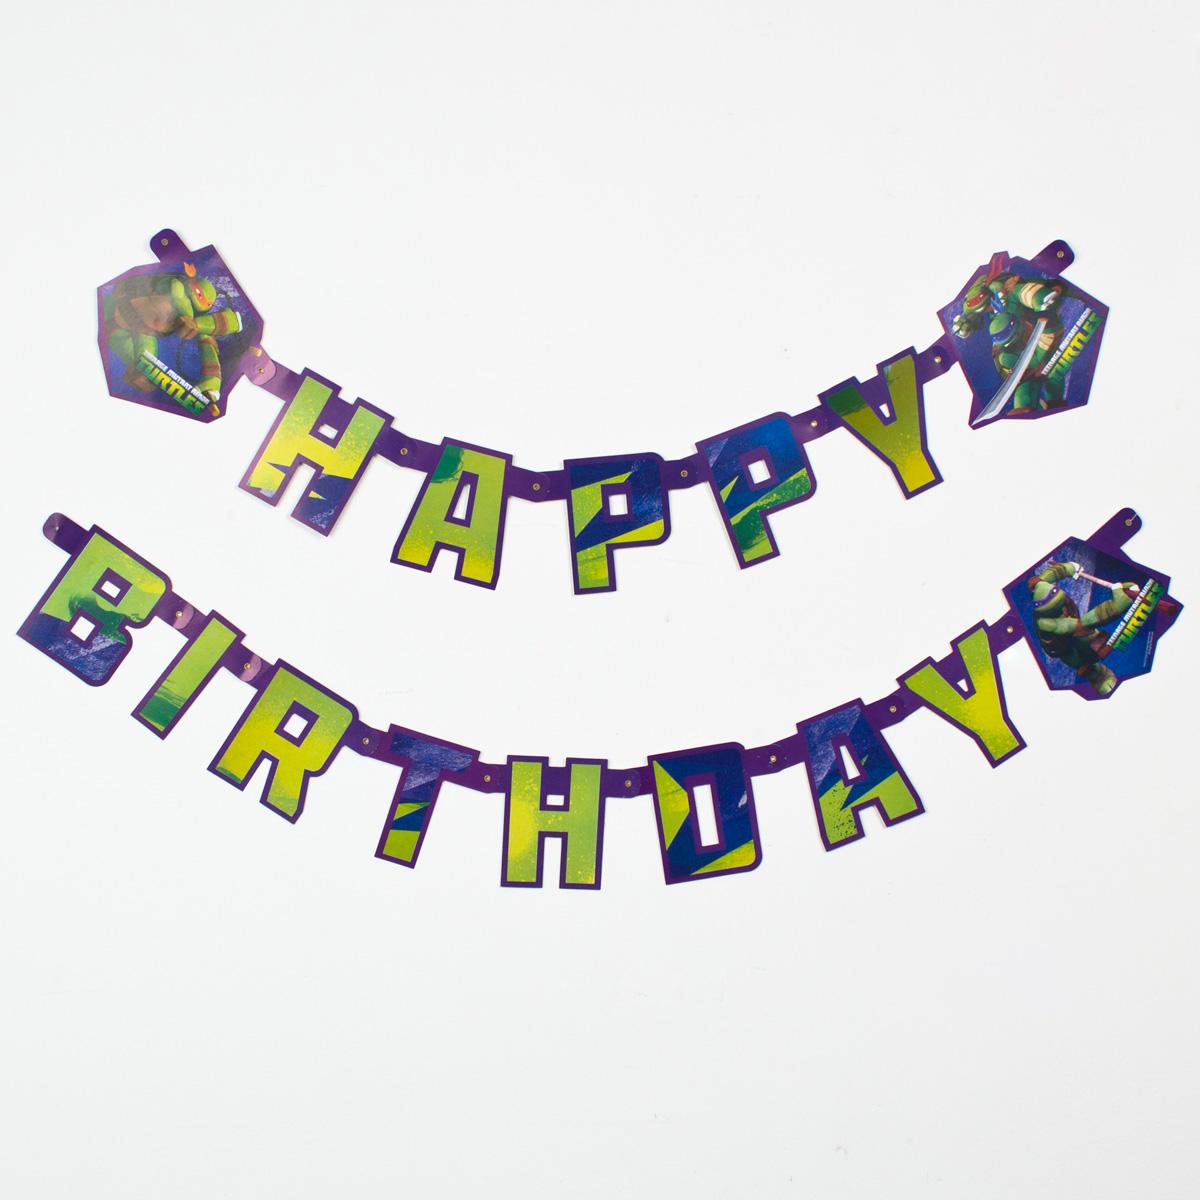 Teenage Mutant Ninja Turtles Happy Birthday Letter Banner